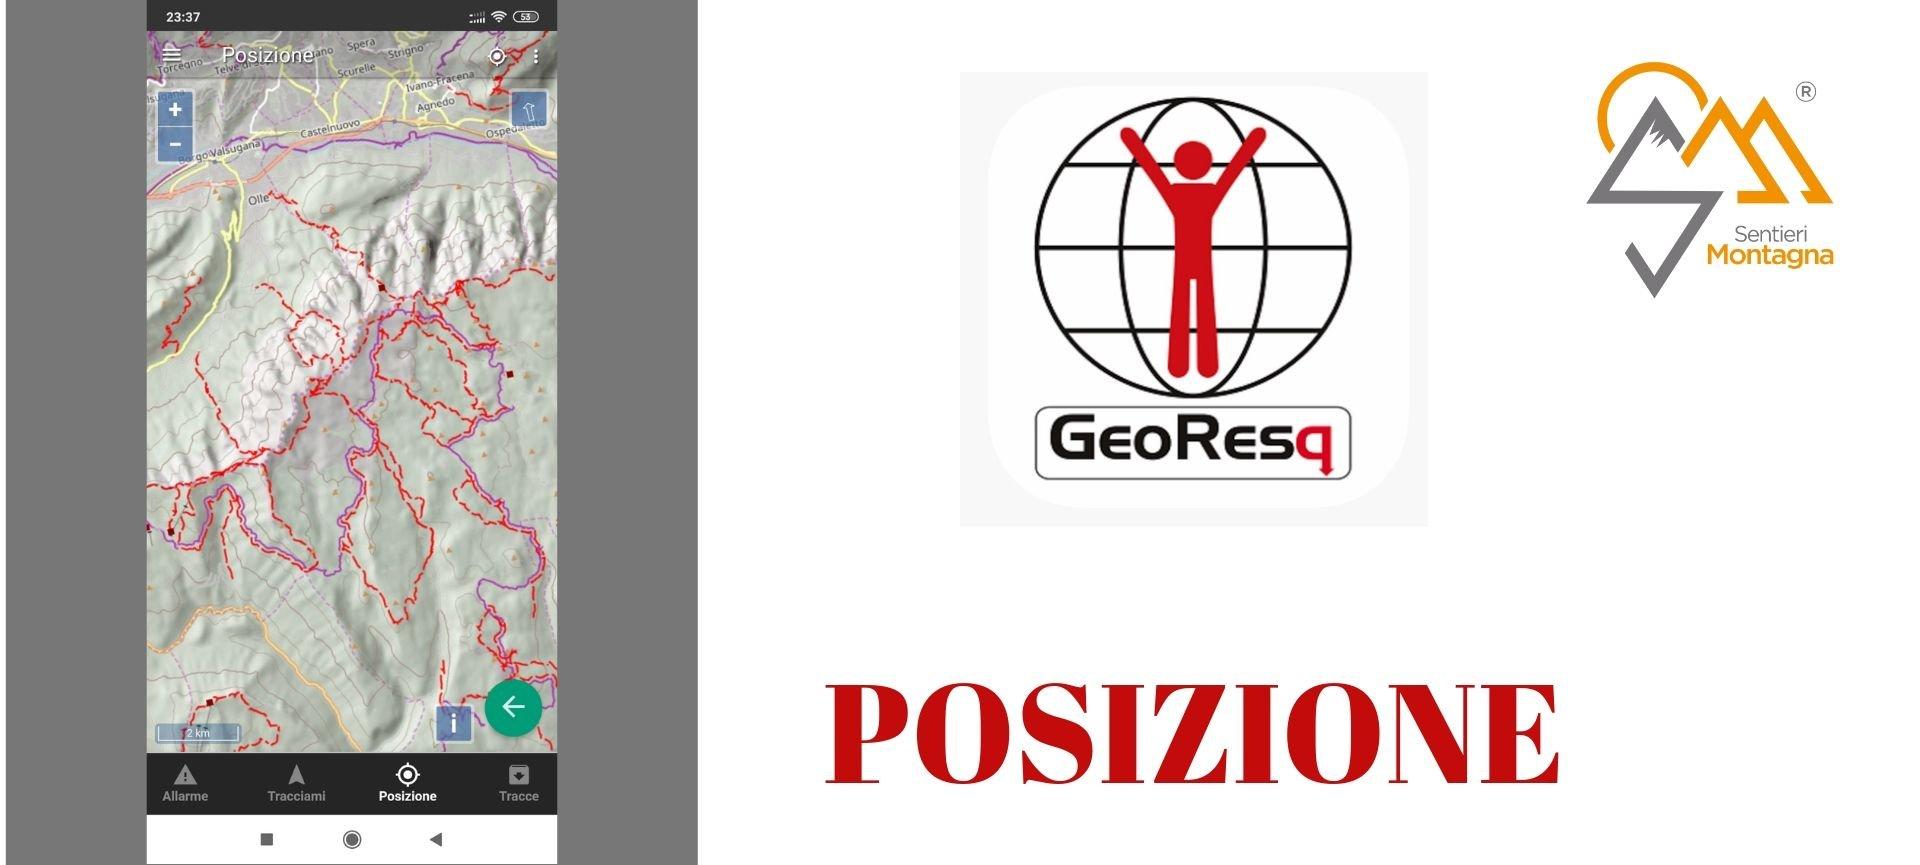 georesq posizione